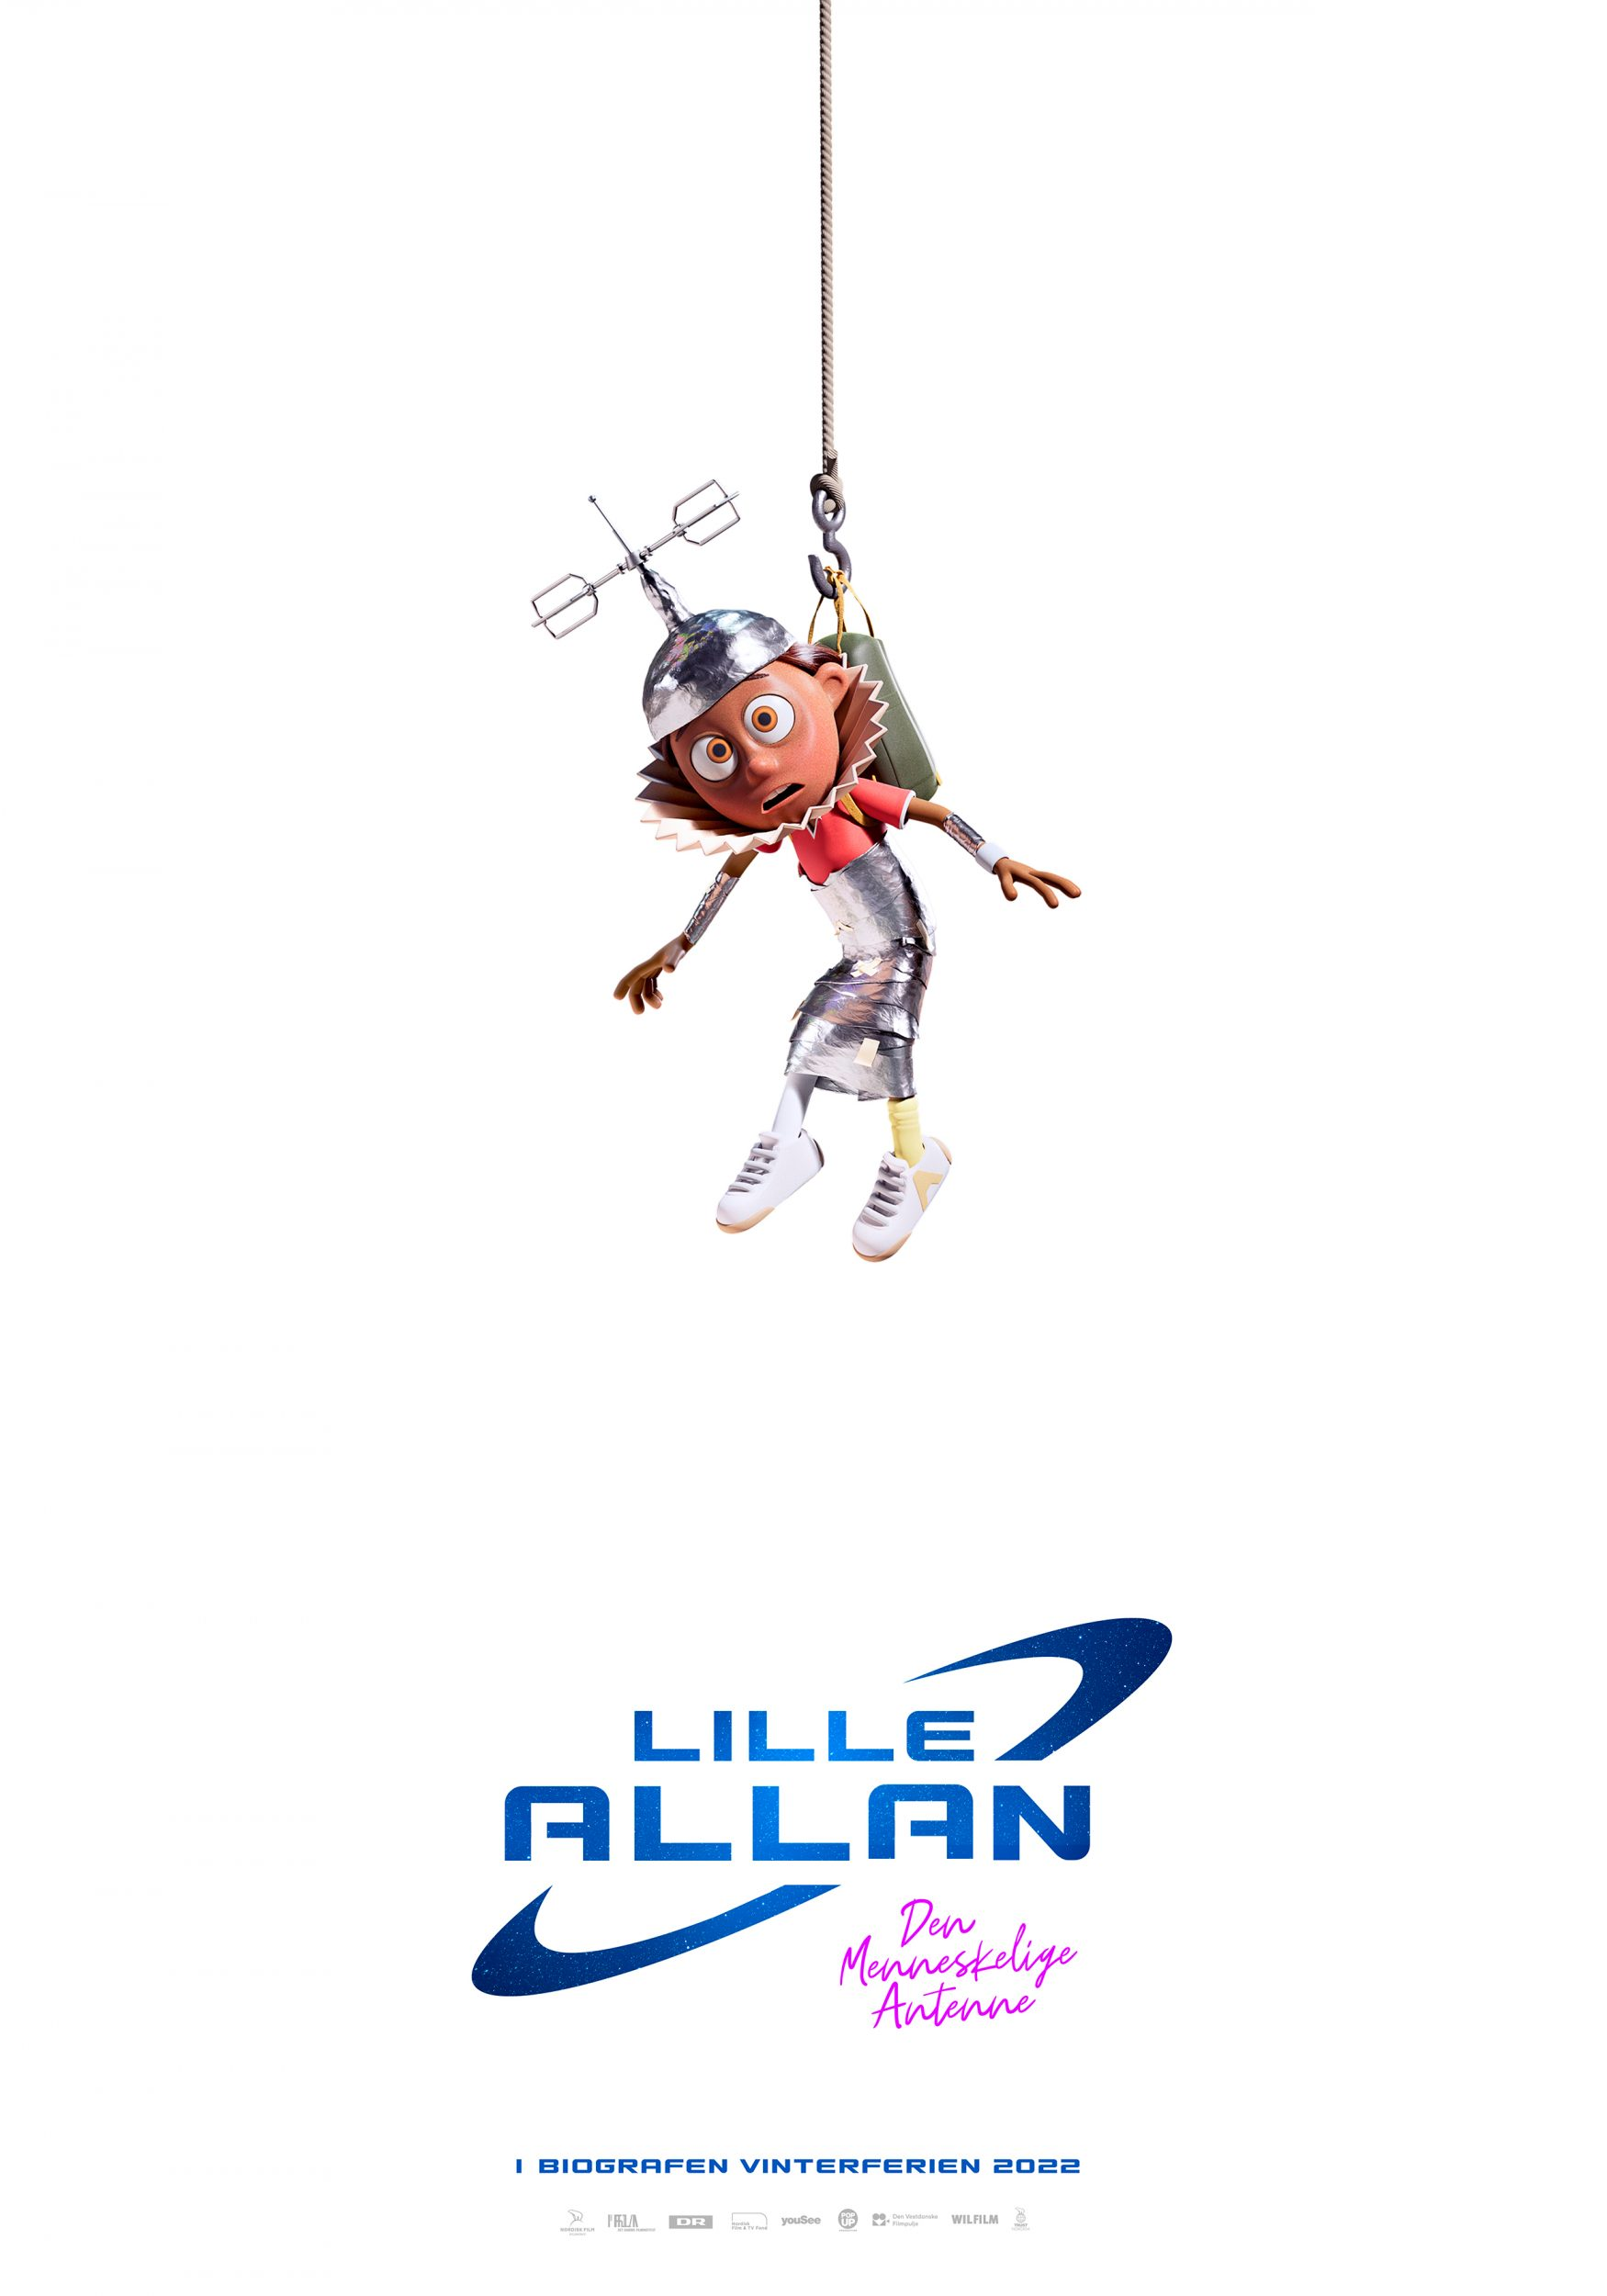 Lille Allan / Little Allan